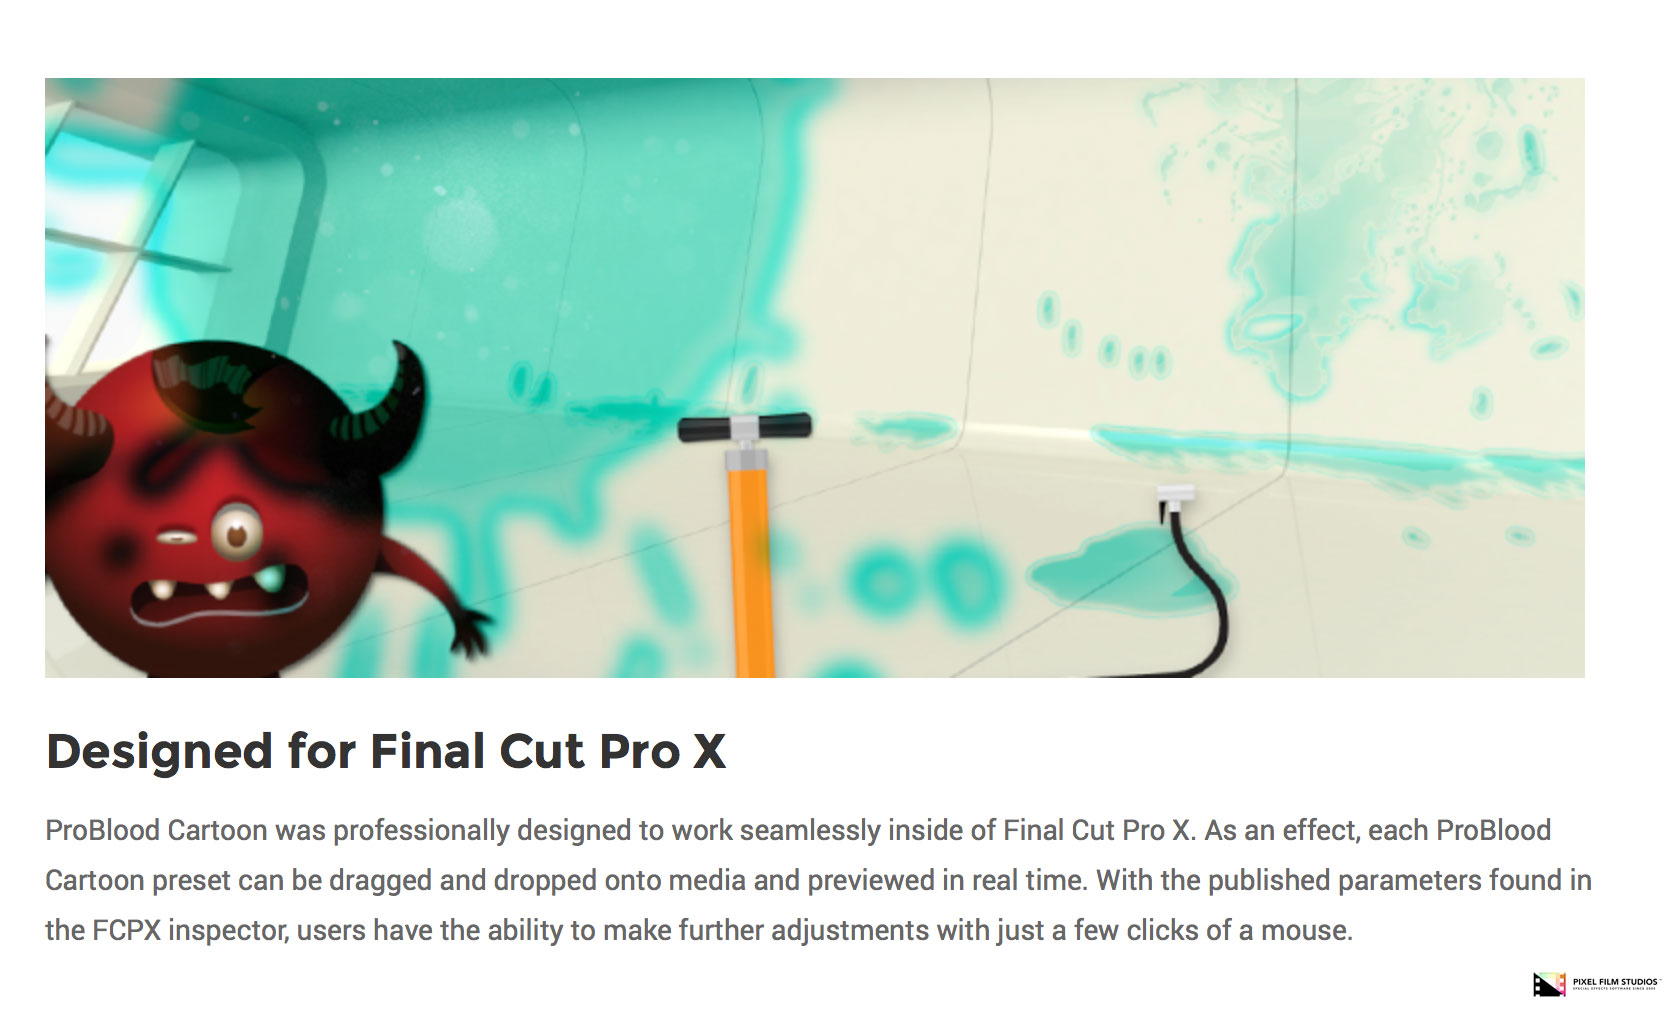 Pixel Film Studios Set to Release ProBlood Cartoon for Final Cut Pro X